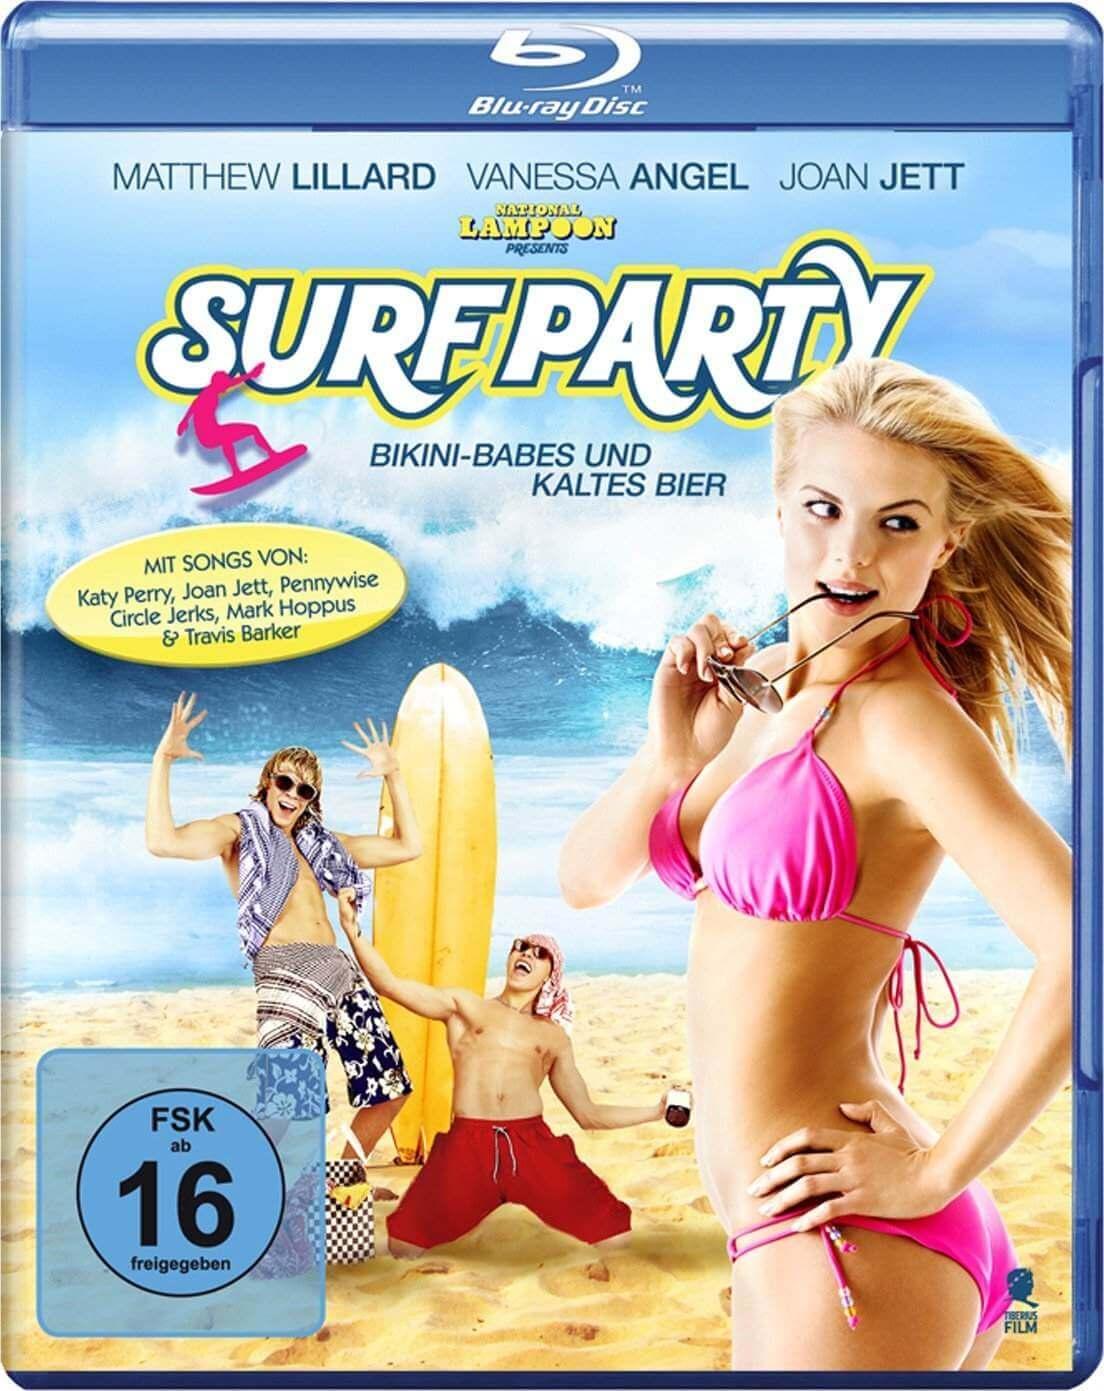 فيلم national lampoon presents: surf party 2013 مترجم للكبار فقط